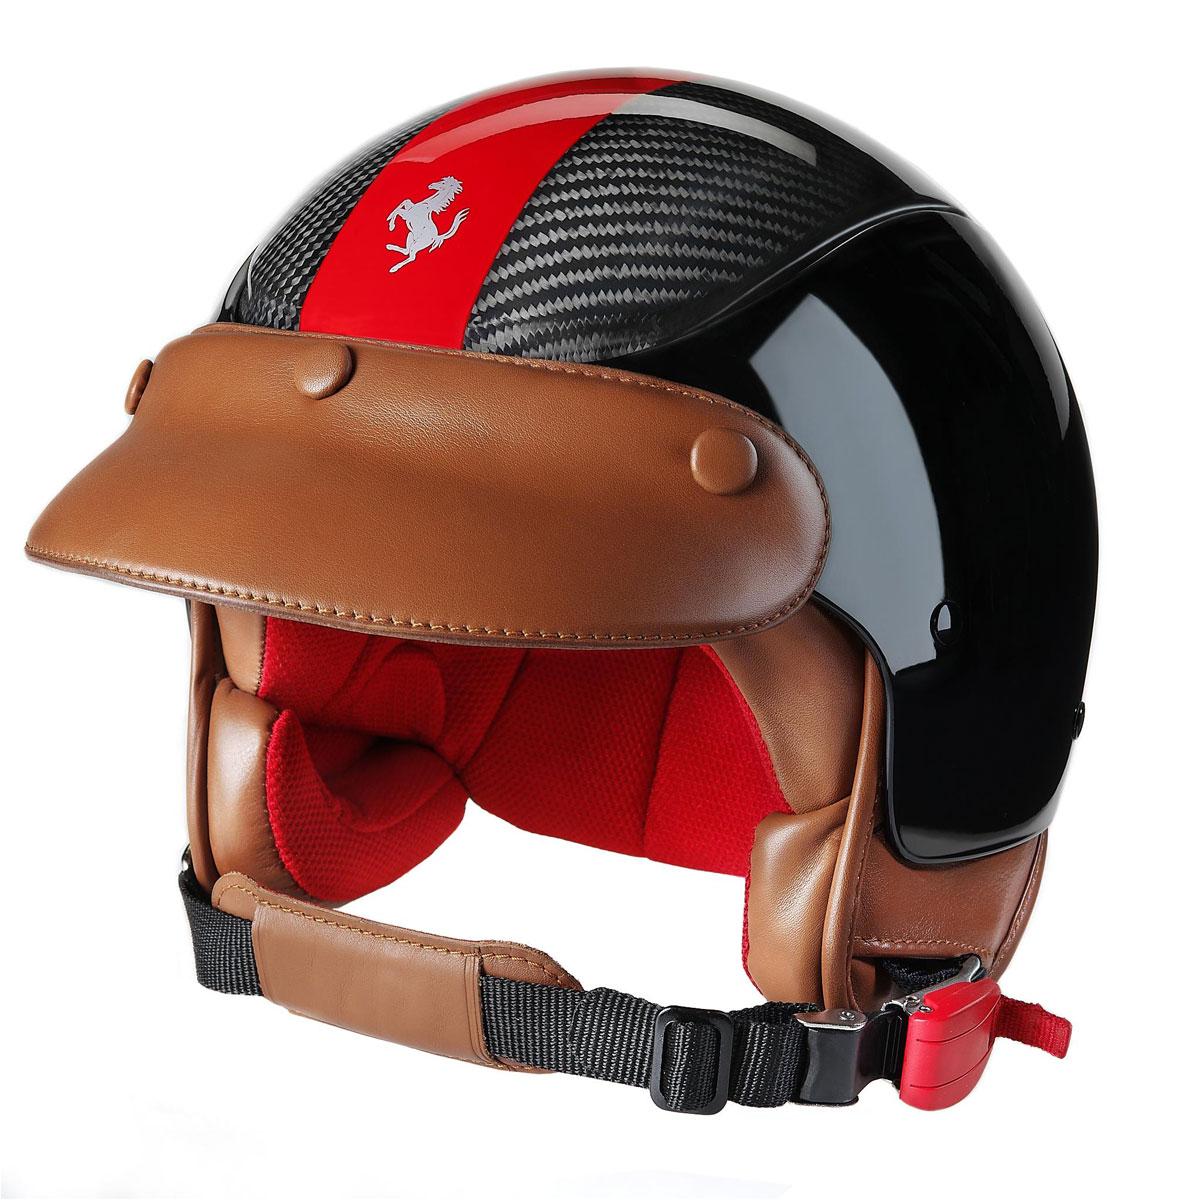 Ferrari Scooter Helmet